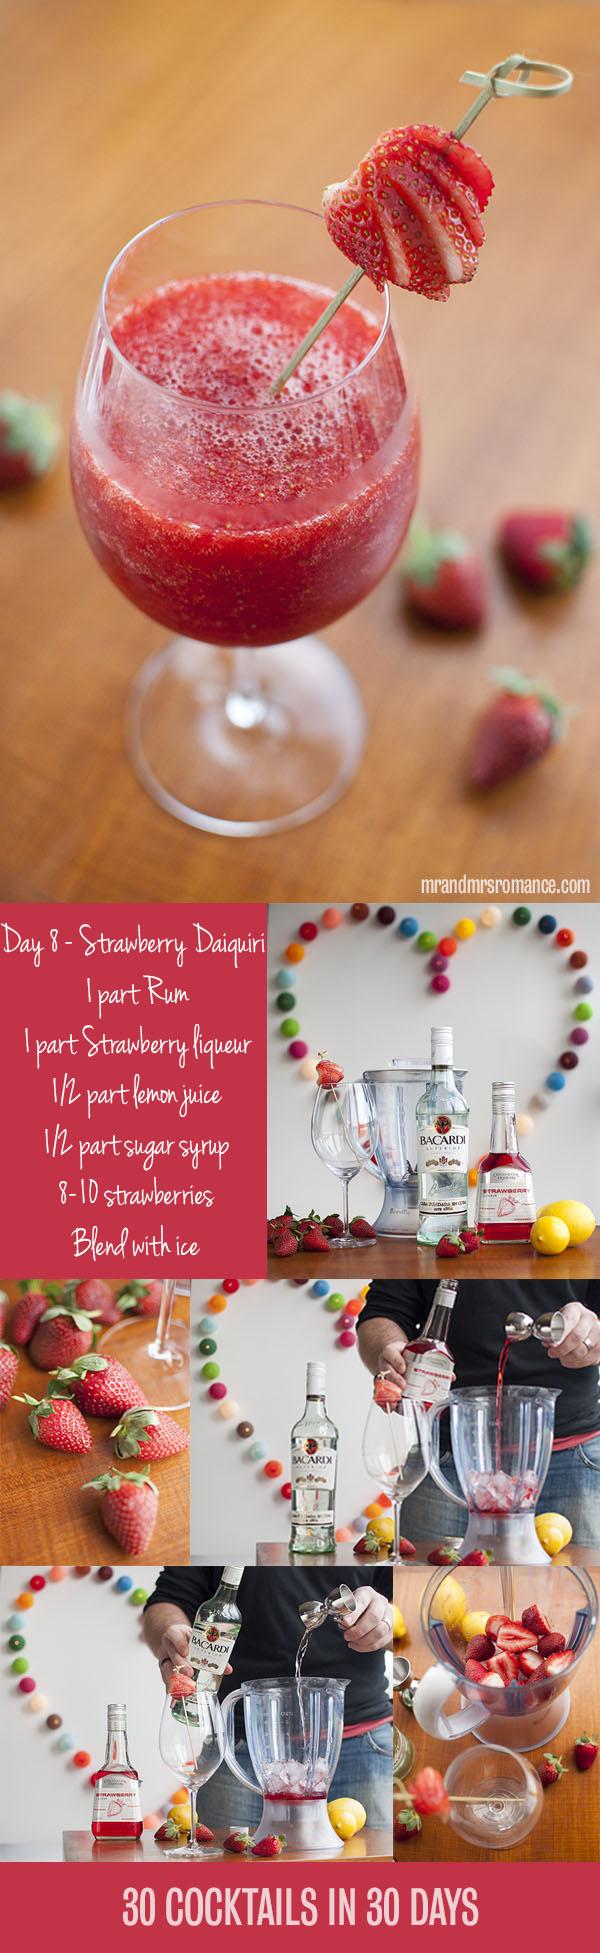 Mr and Mrs Romance - Day 8 - Strawberry Daiquiri Cocktail Recipe